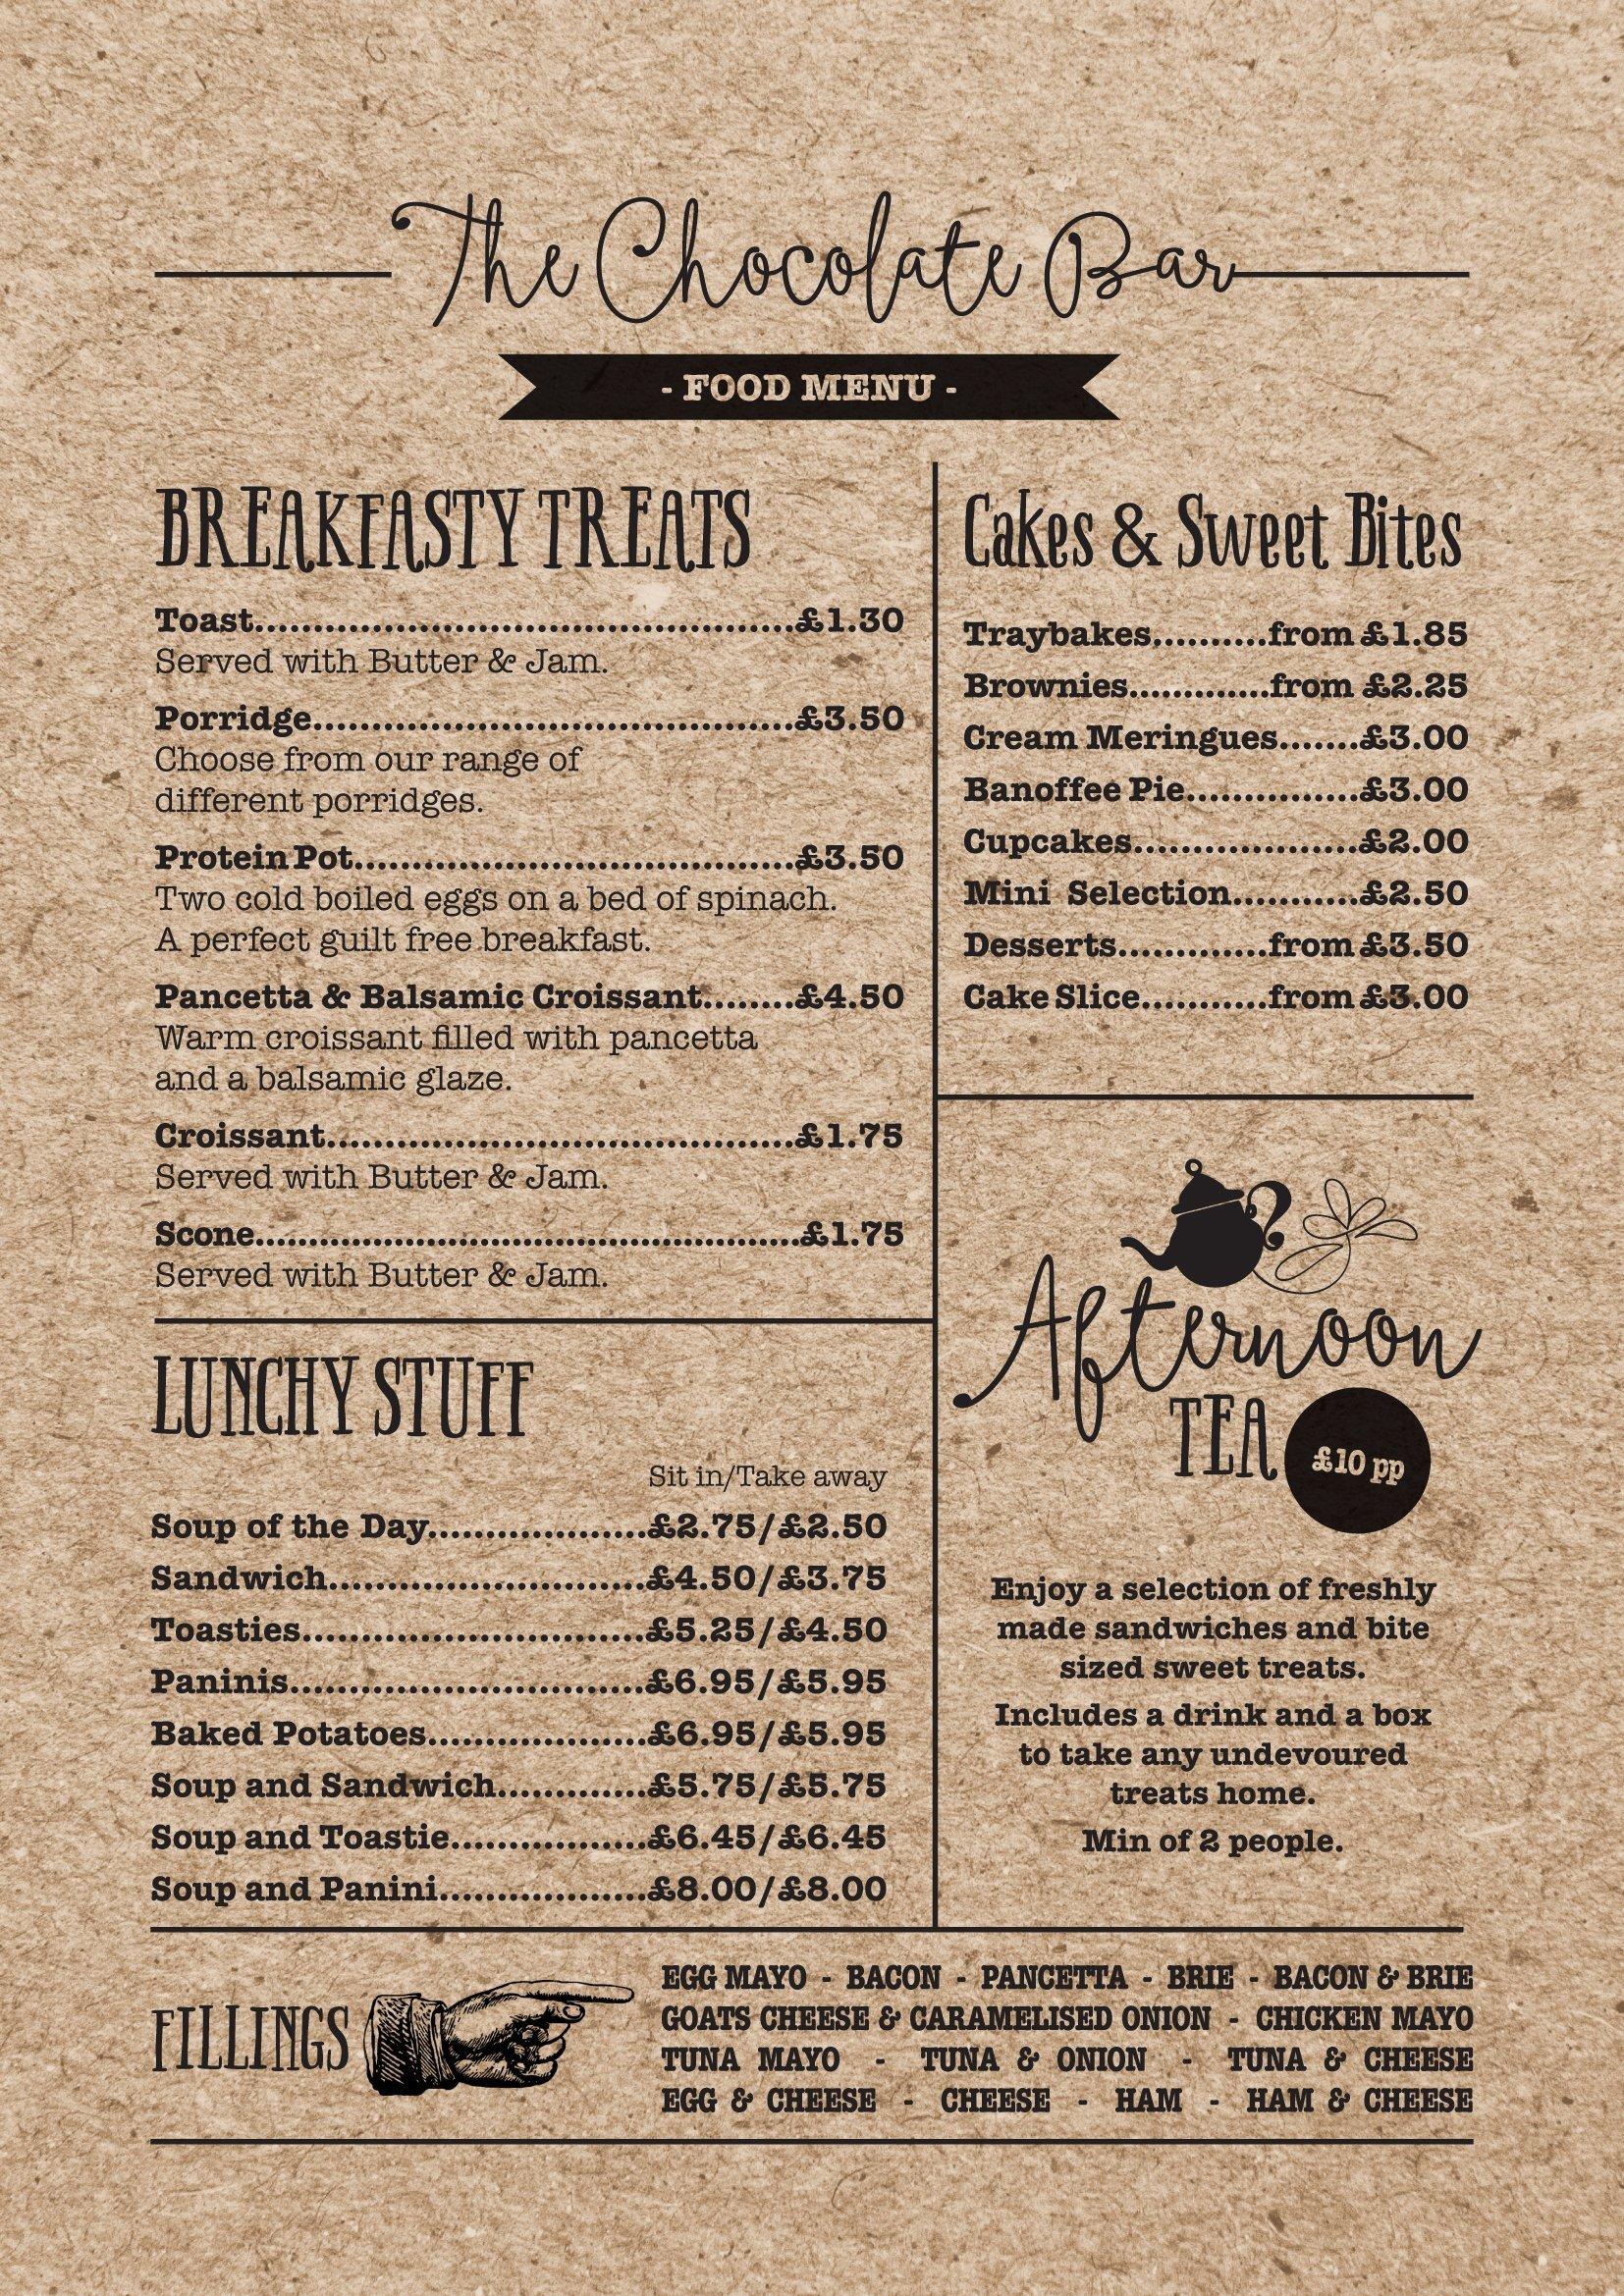 vintage design of a food menu